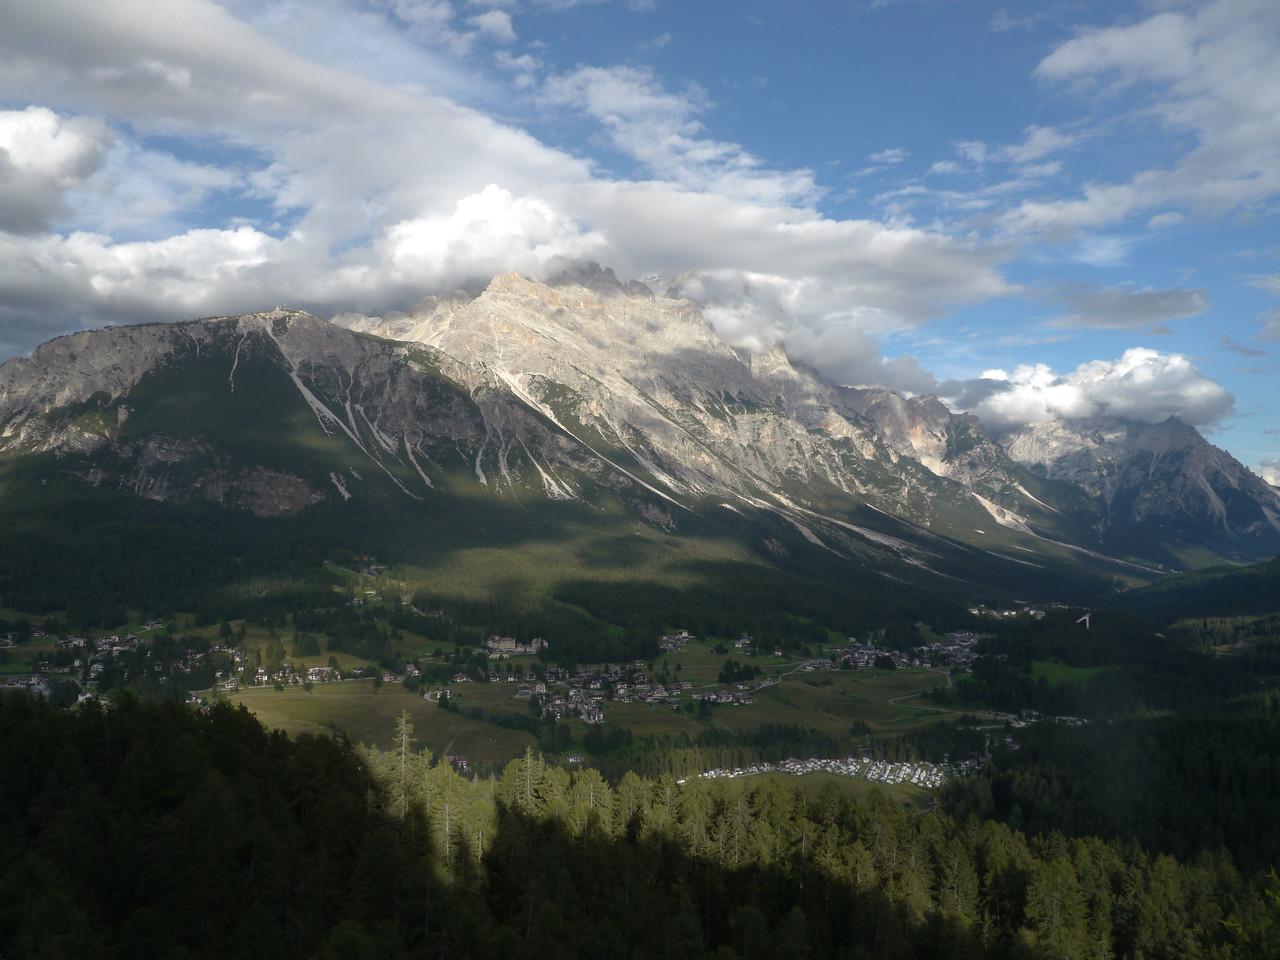 @ 2012 / Pocol, Cortina D'Ampezzo, Veneto, ITA, Italien, 1432 m ü/M, 17/08/2014 18:23:33